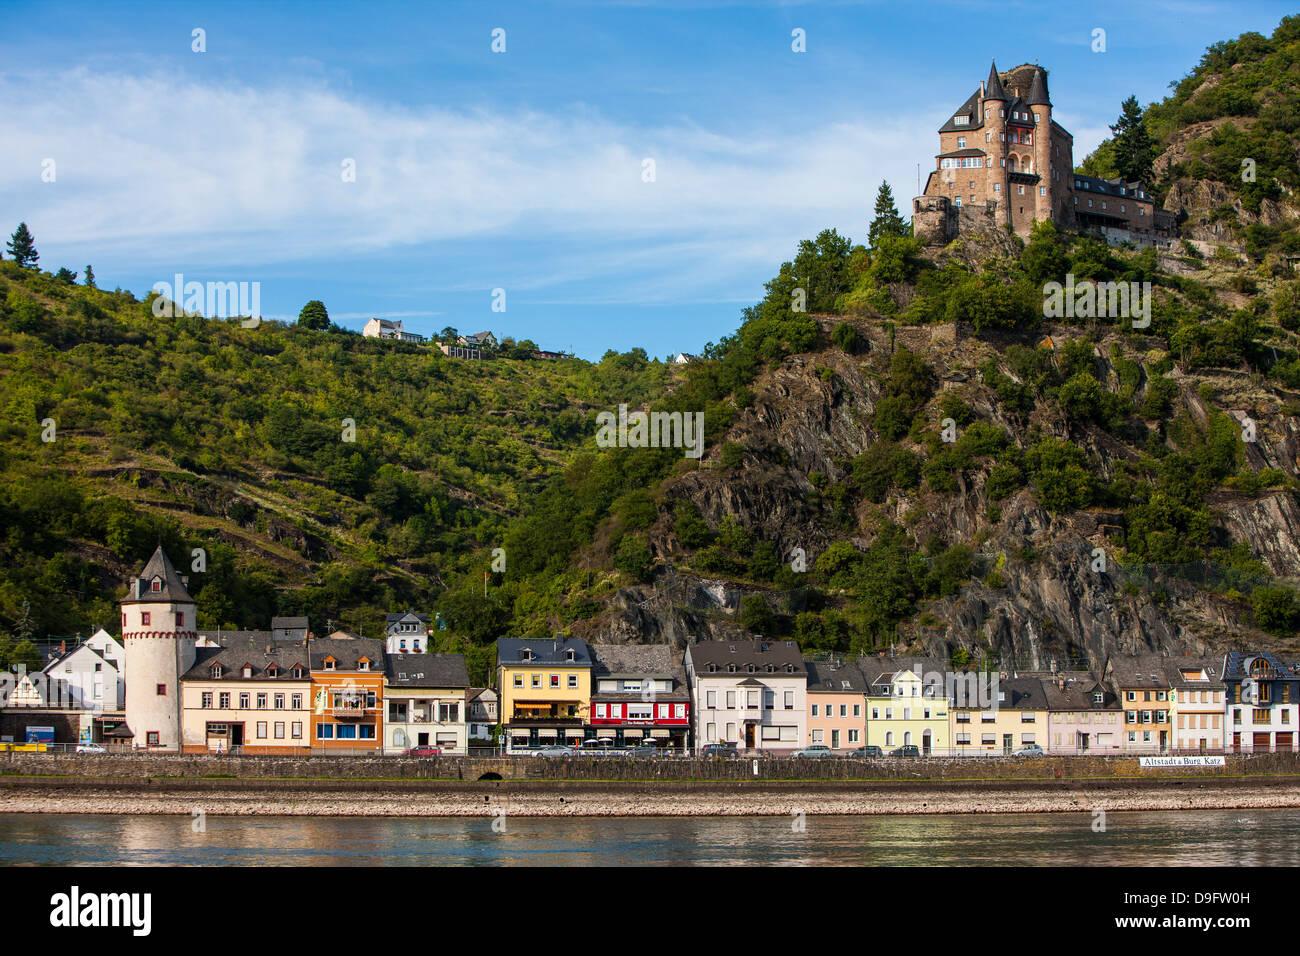 Castle Gutenfels above Kaub in the Rhine valley, Rhineland-Palatinate, Germany - Stock Image